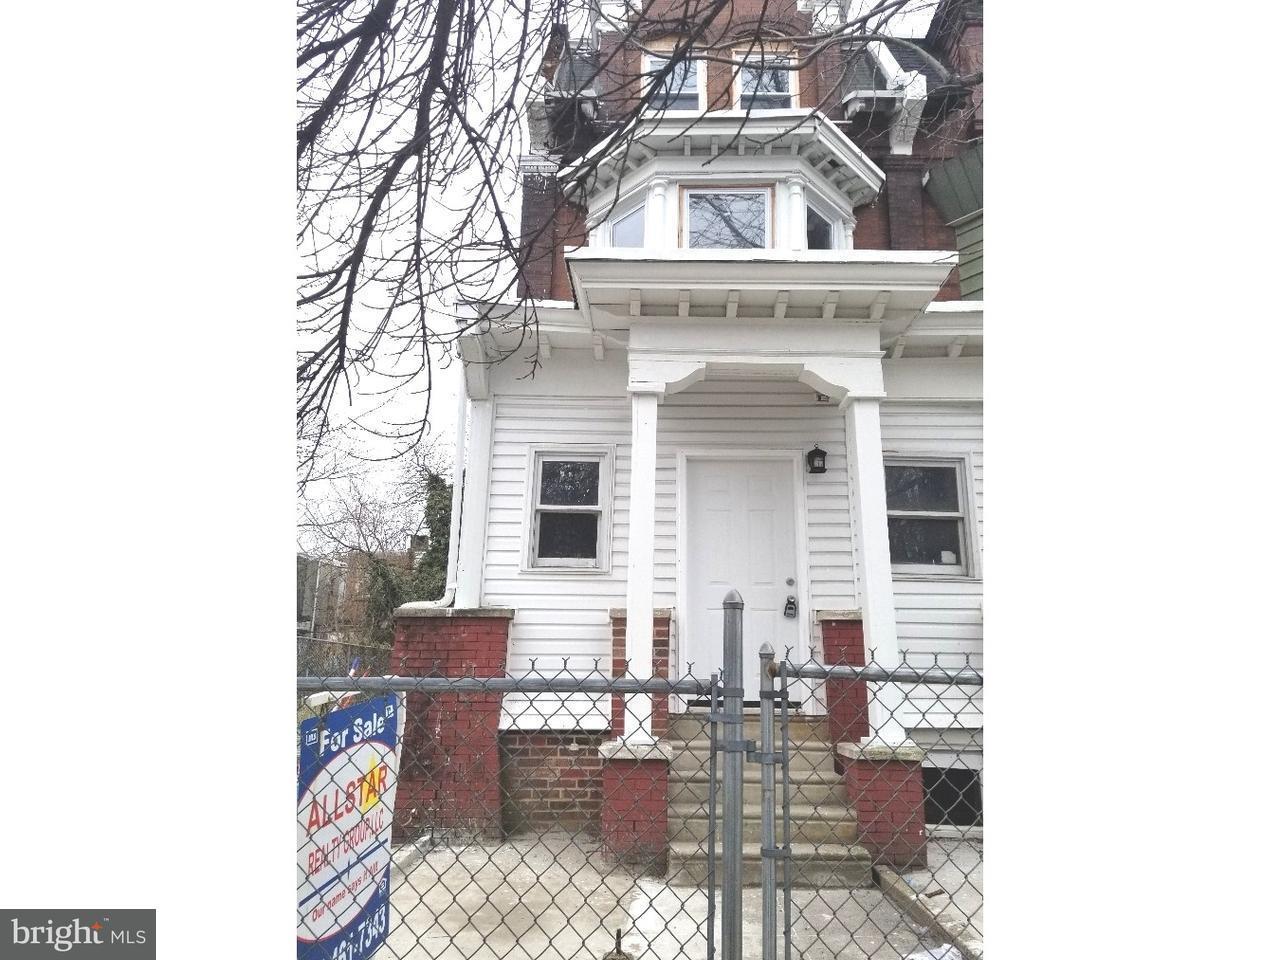 1318 S 53RD Philadelphia, PA 19143